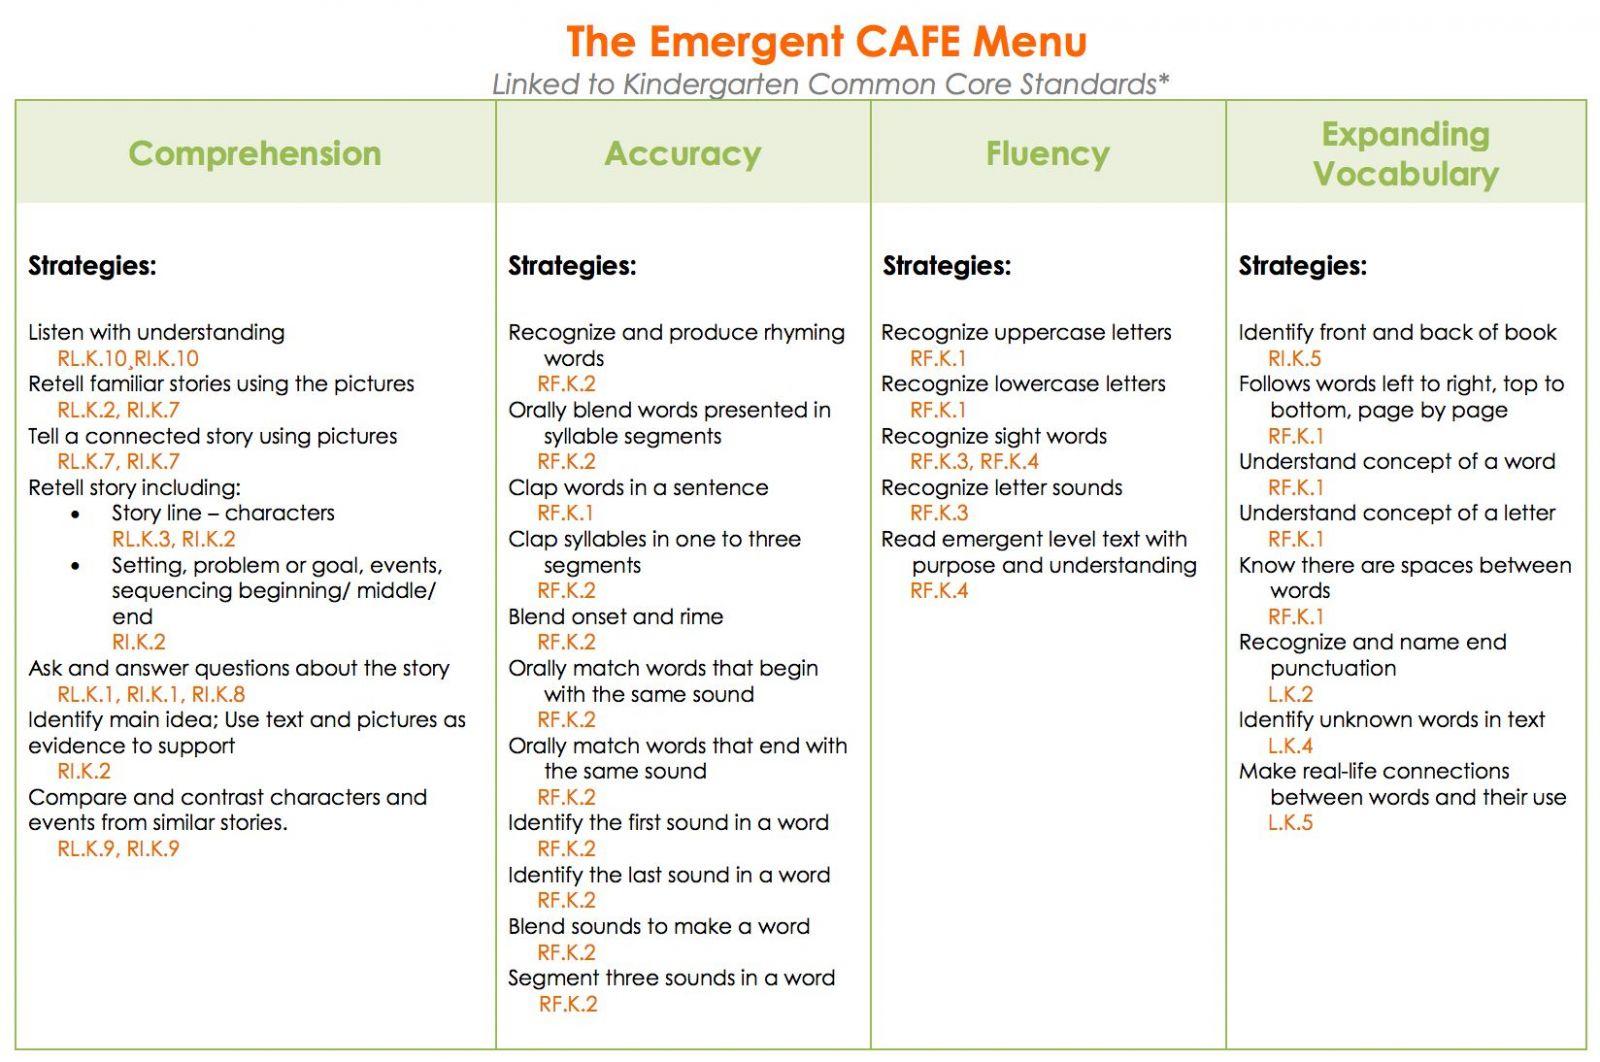 Emergent CAFE Menu Aligned to Common Core | TheDailyCAFE com